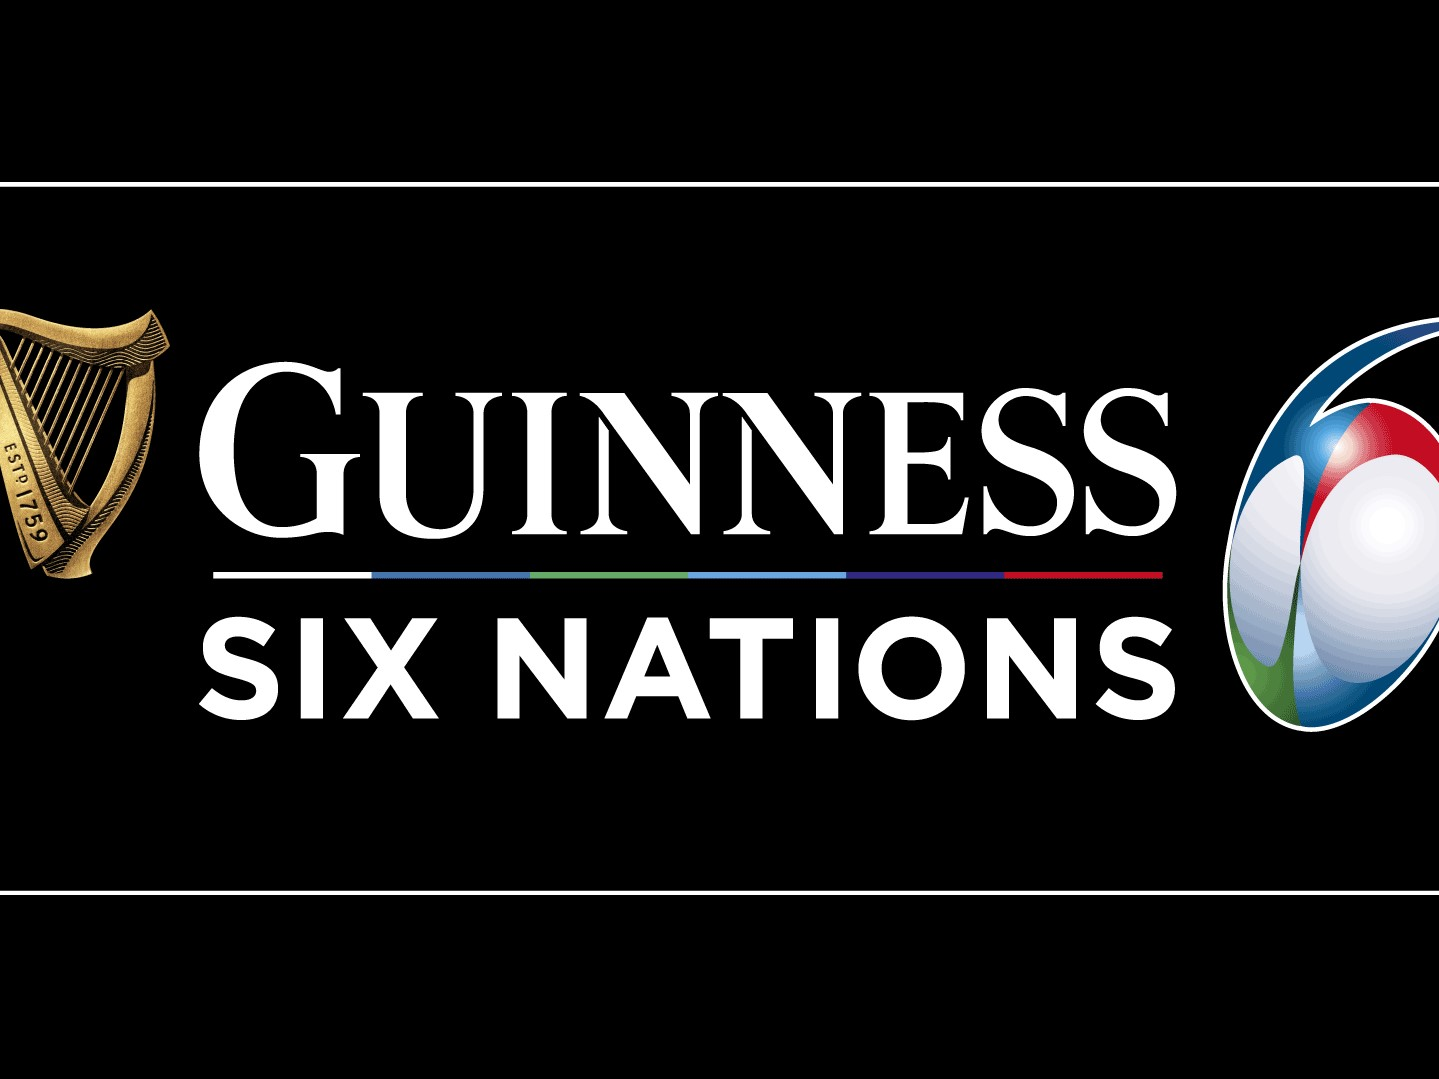 Guinness 6 Nations